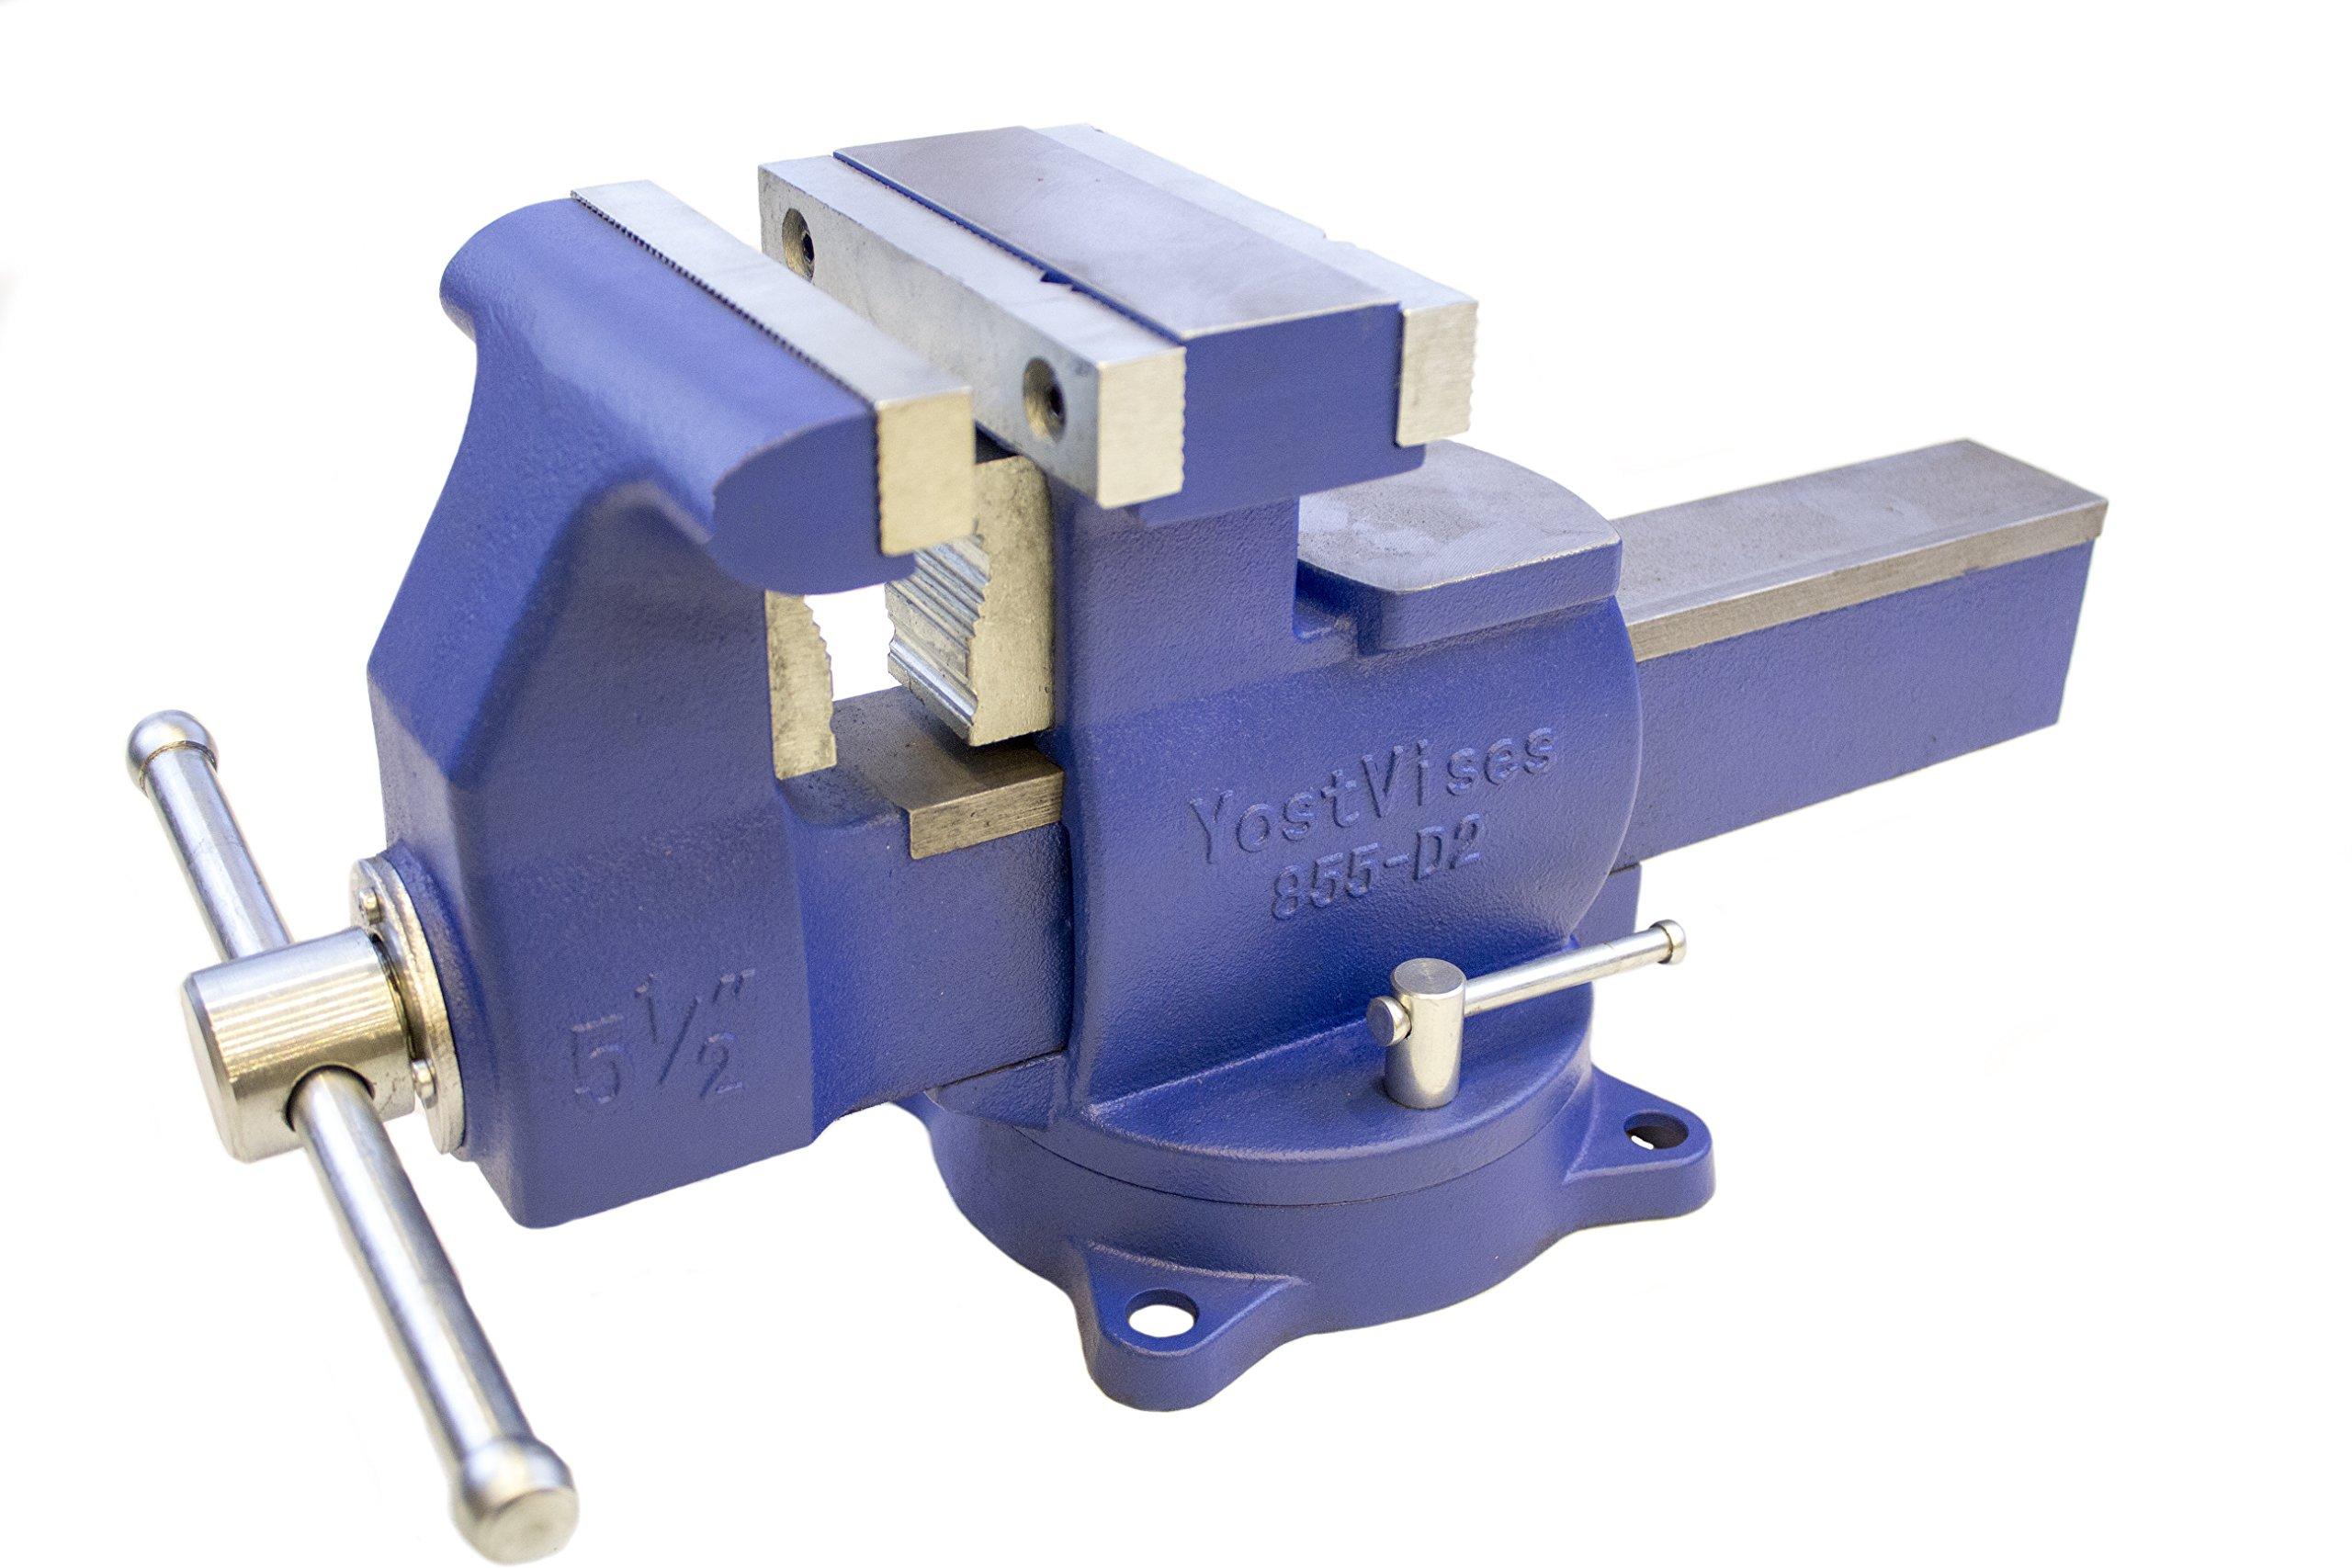 Yost Tools 880-D2 Industrial Grade 8'' Reversible Vise